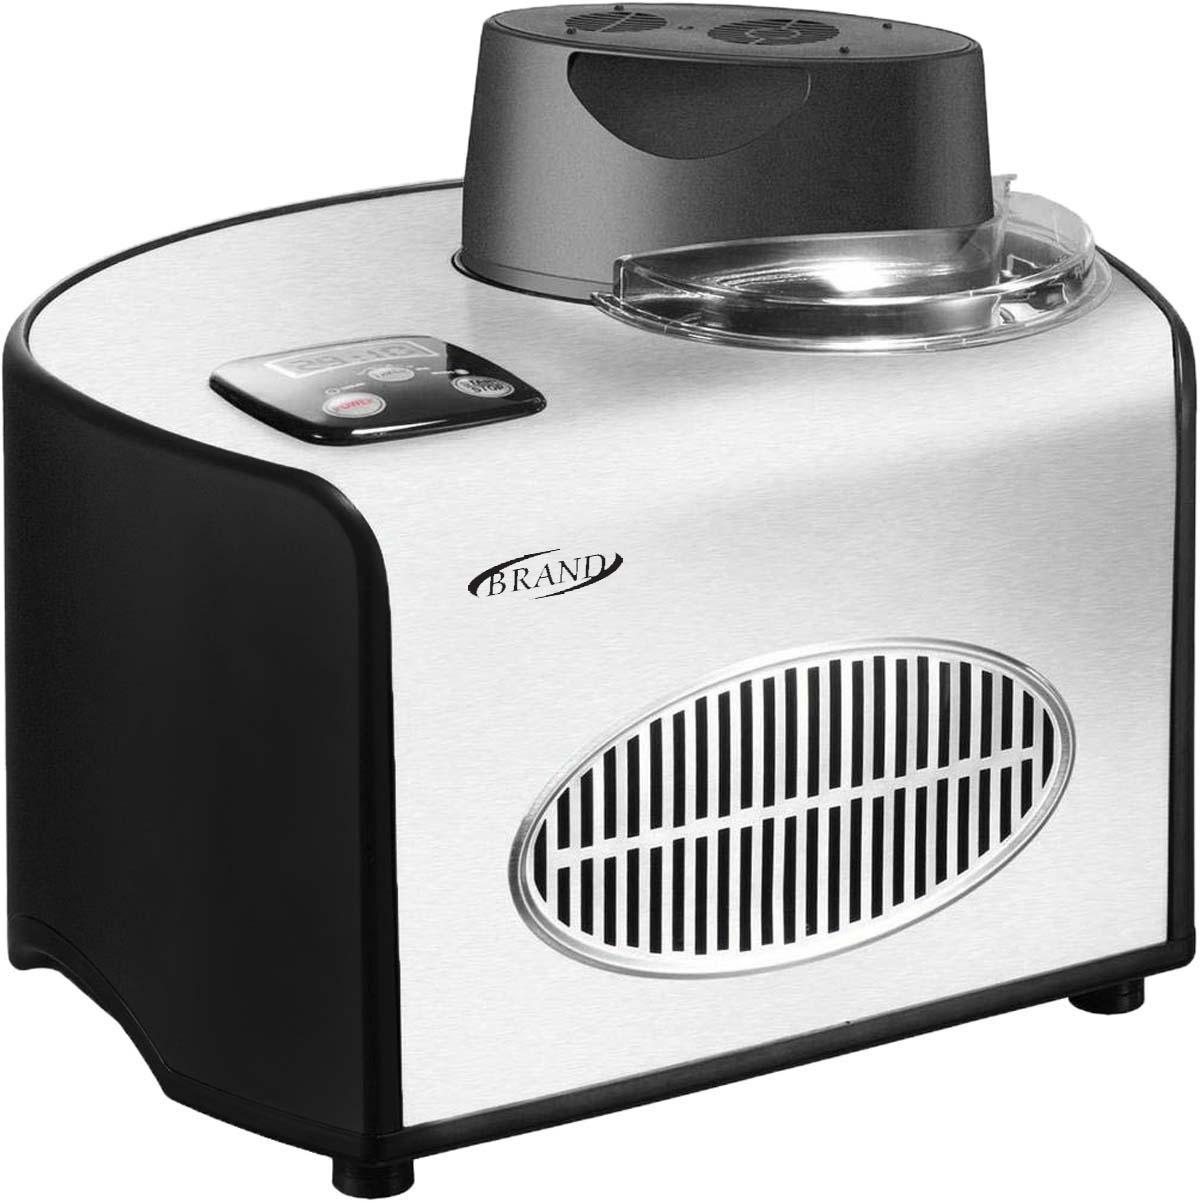 Brand 3812 мороженица - Техника для вечеринок